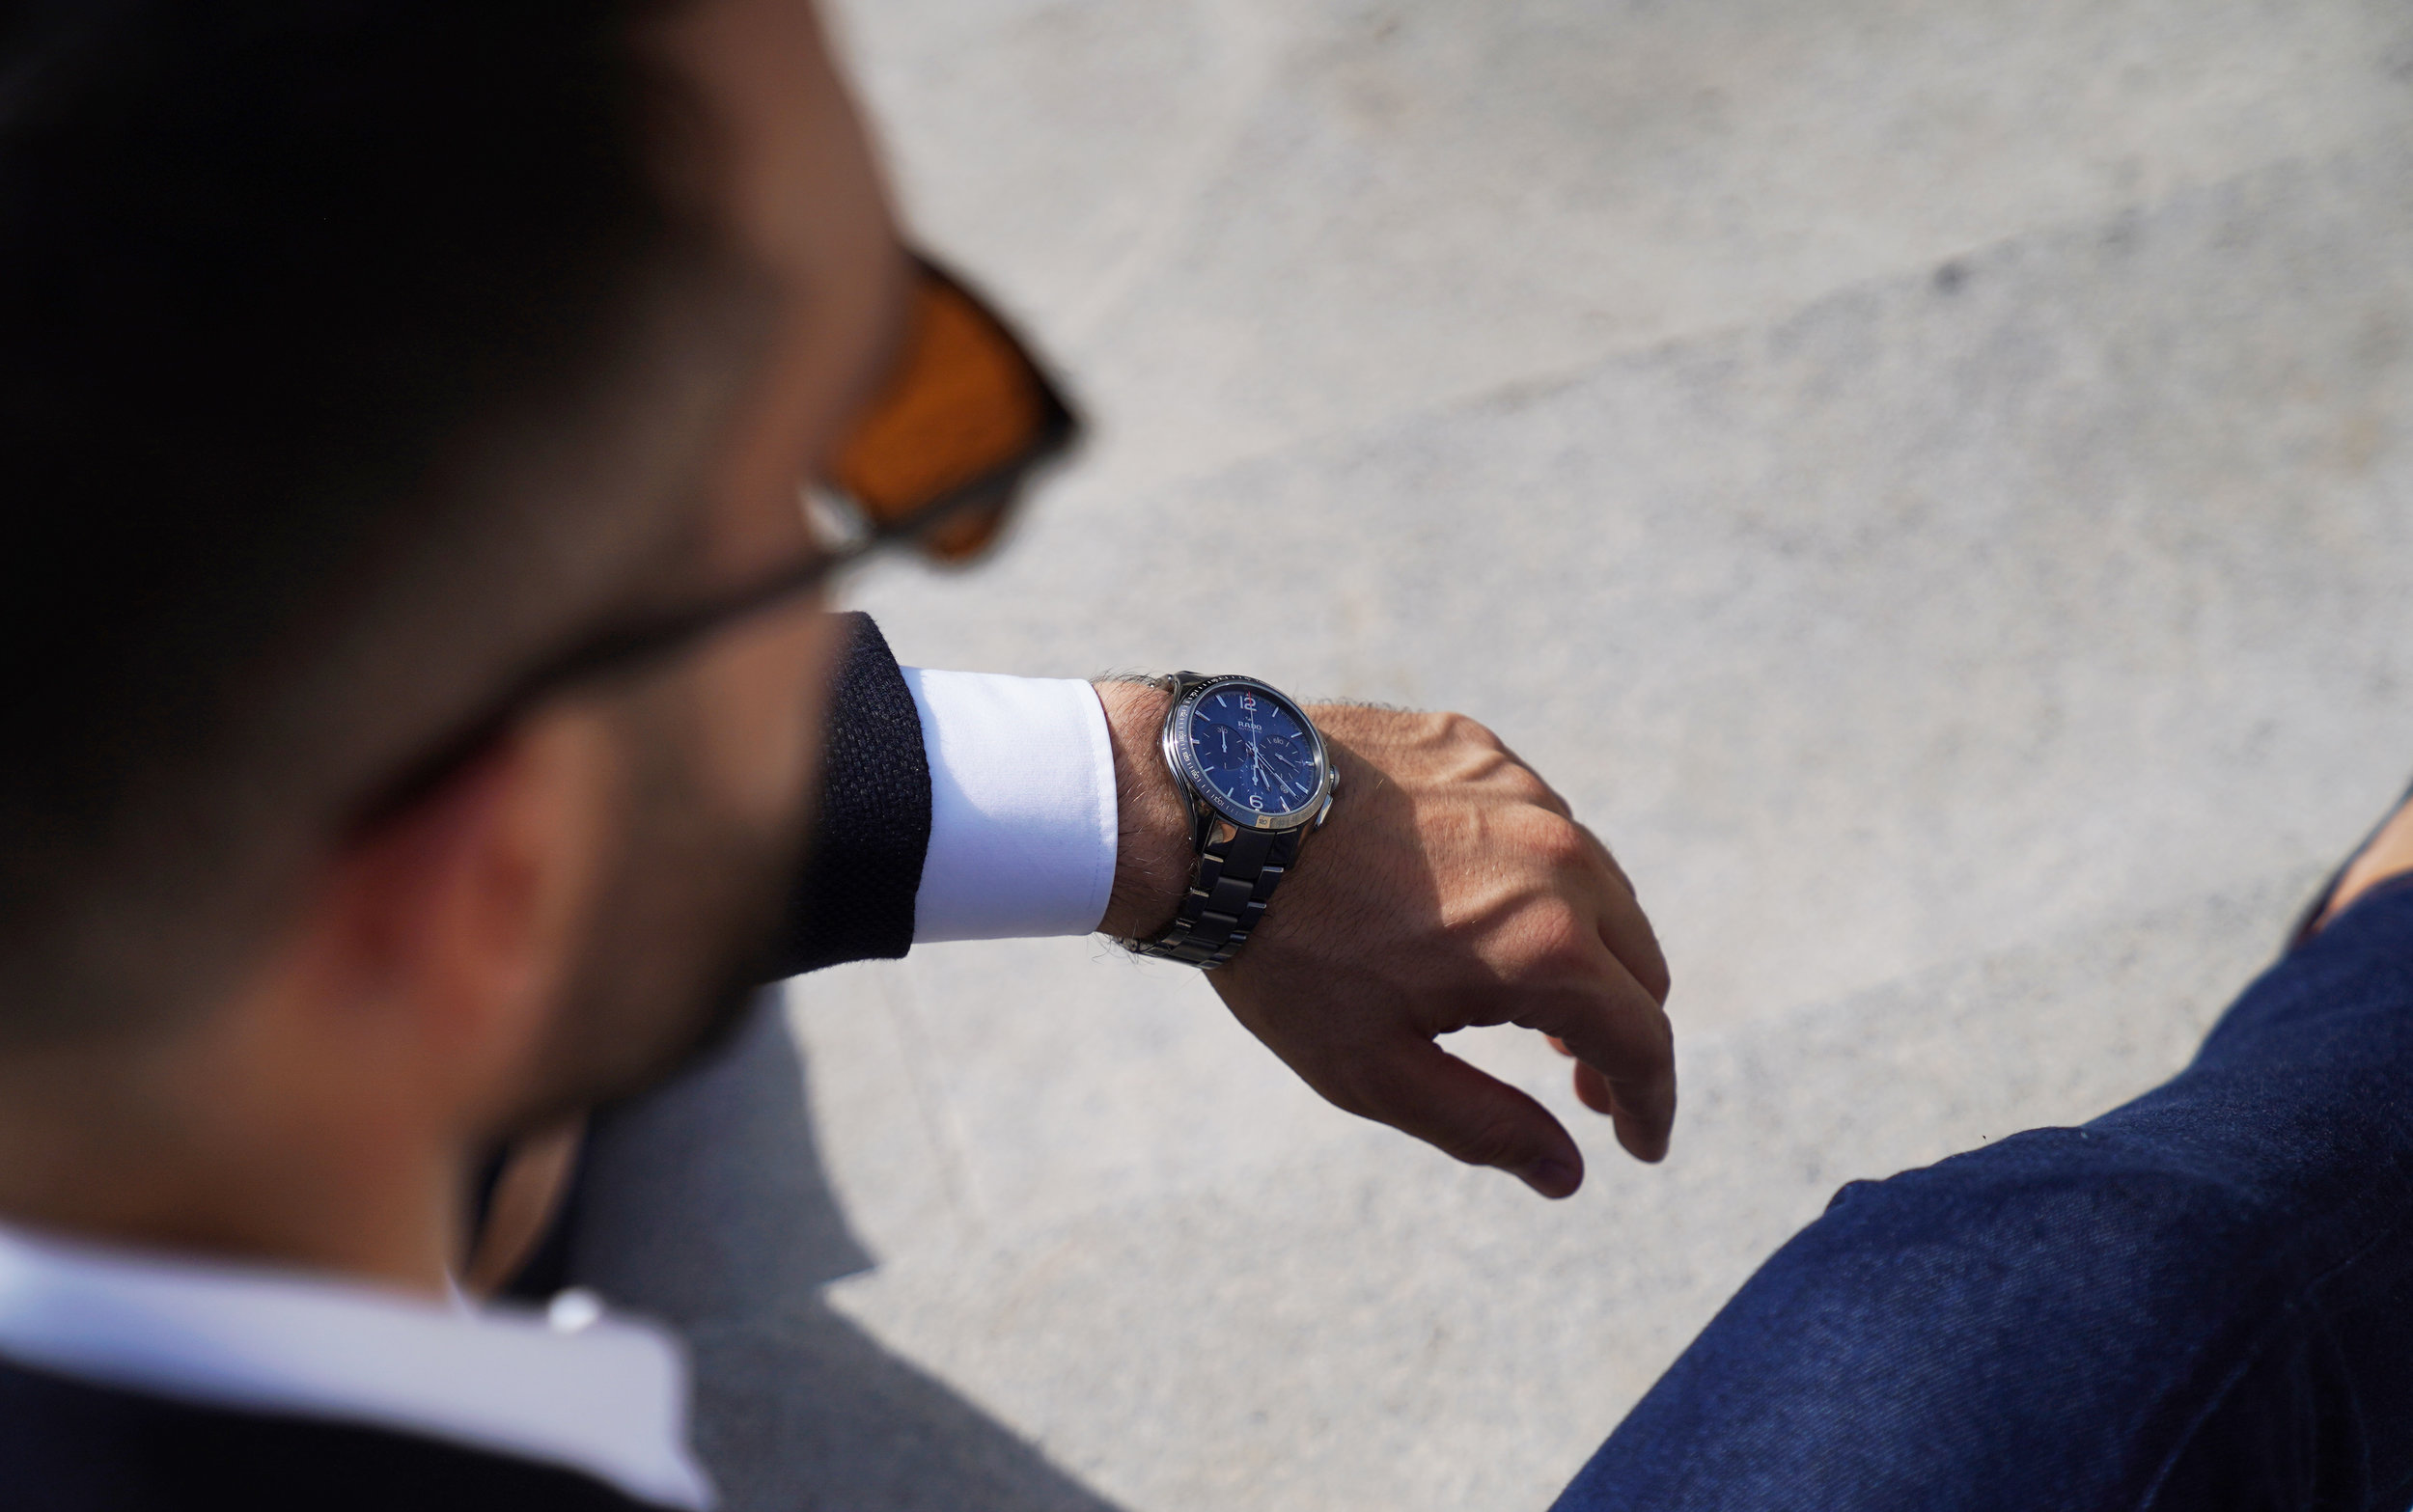 Watch:Rado HyperChrome Automatic Chronograph